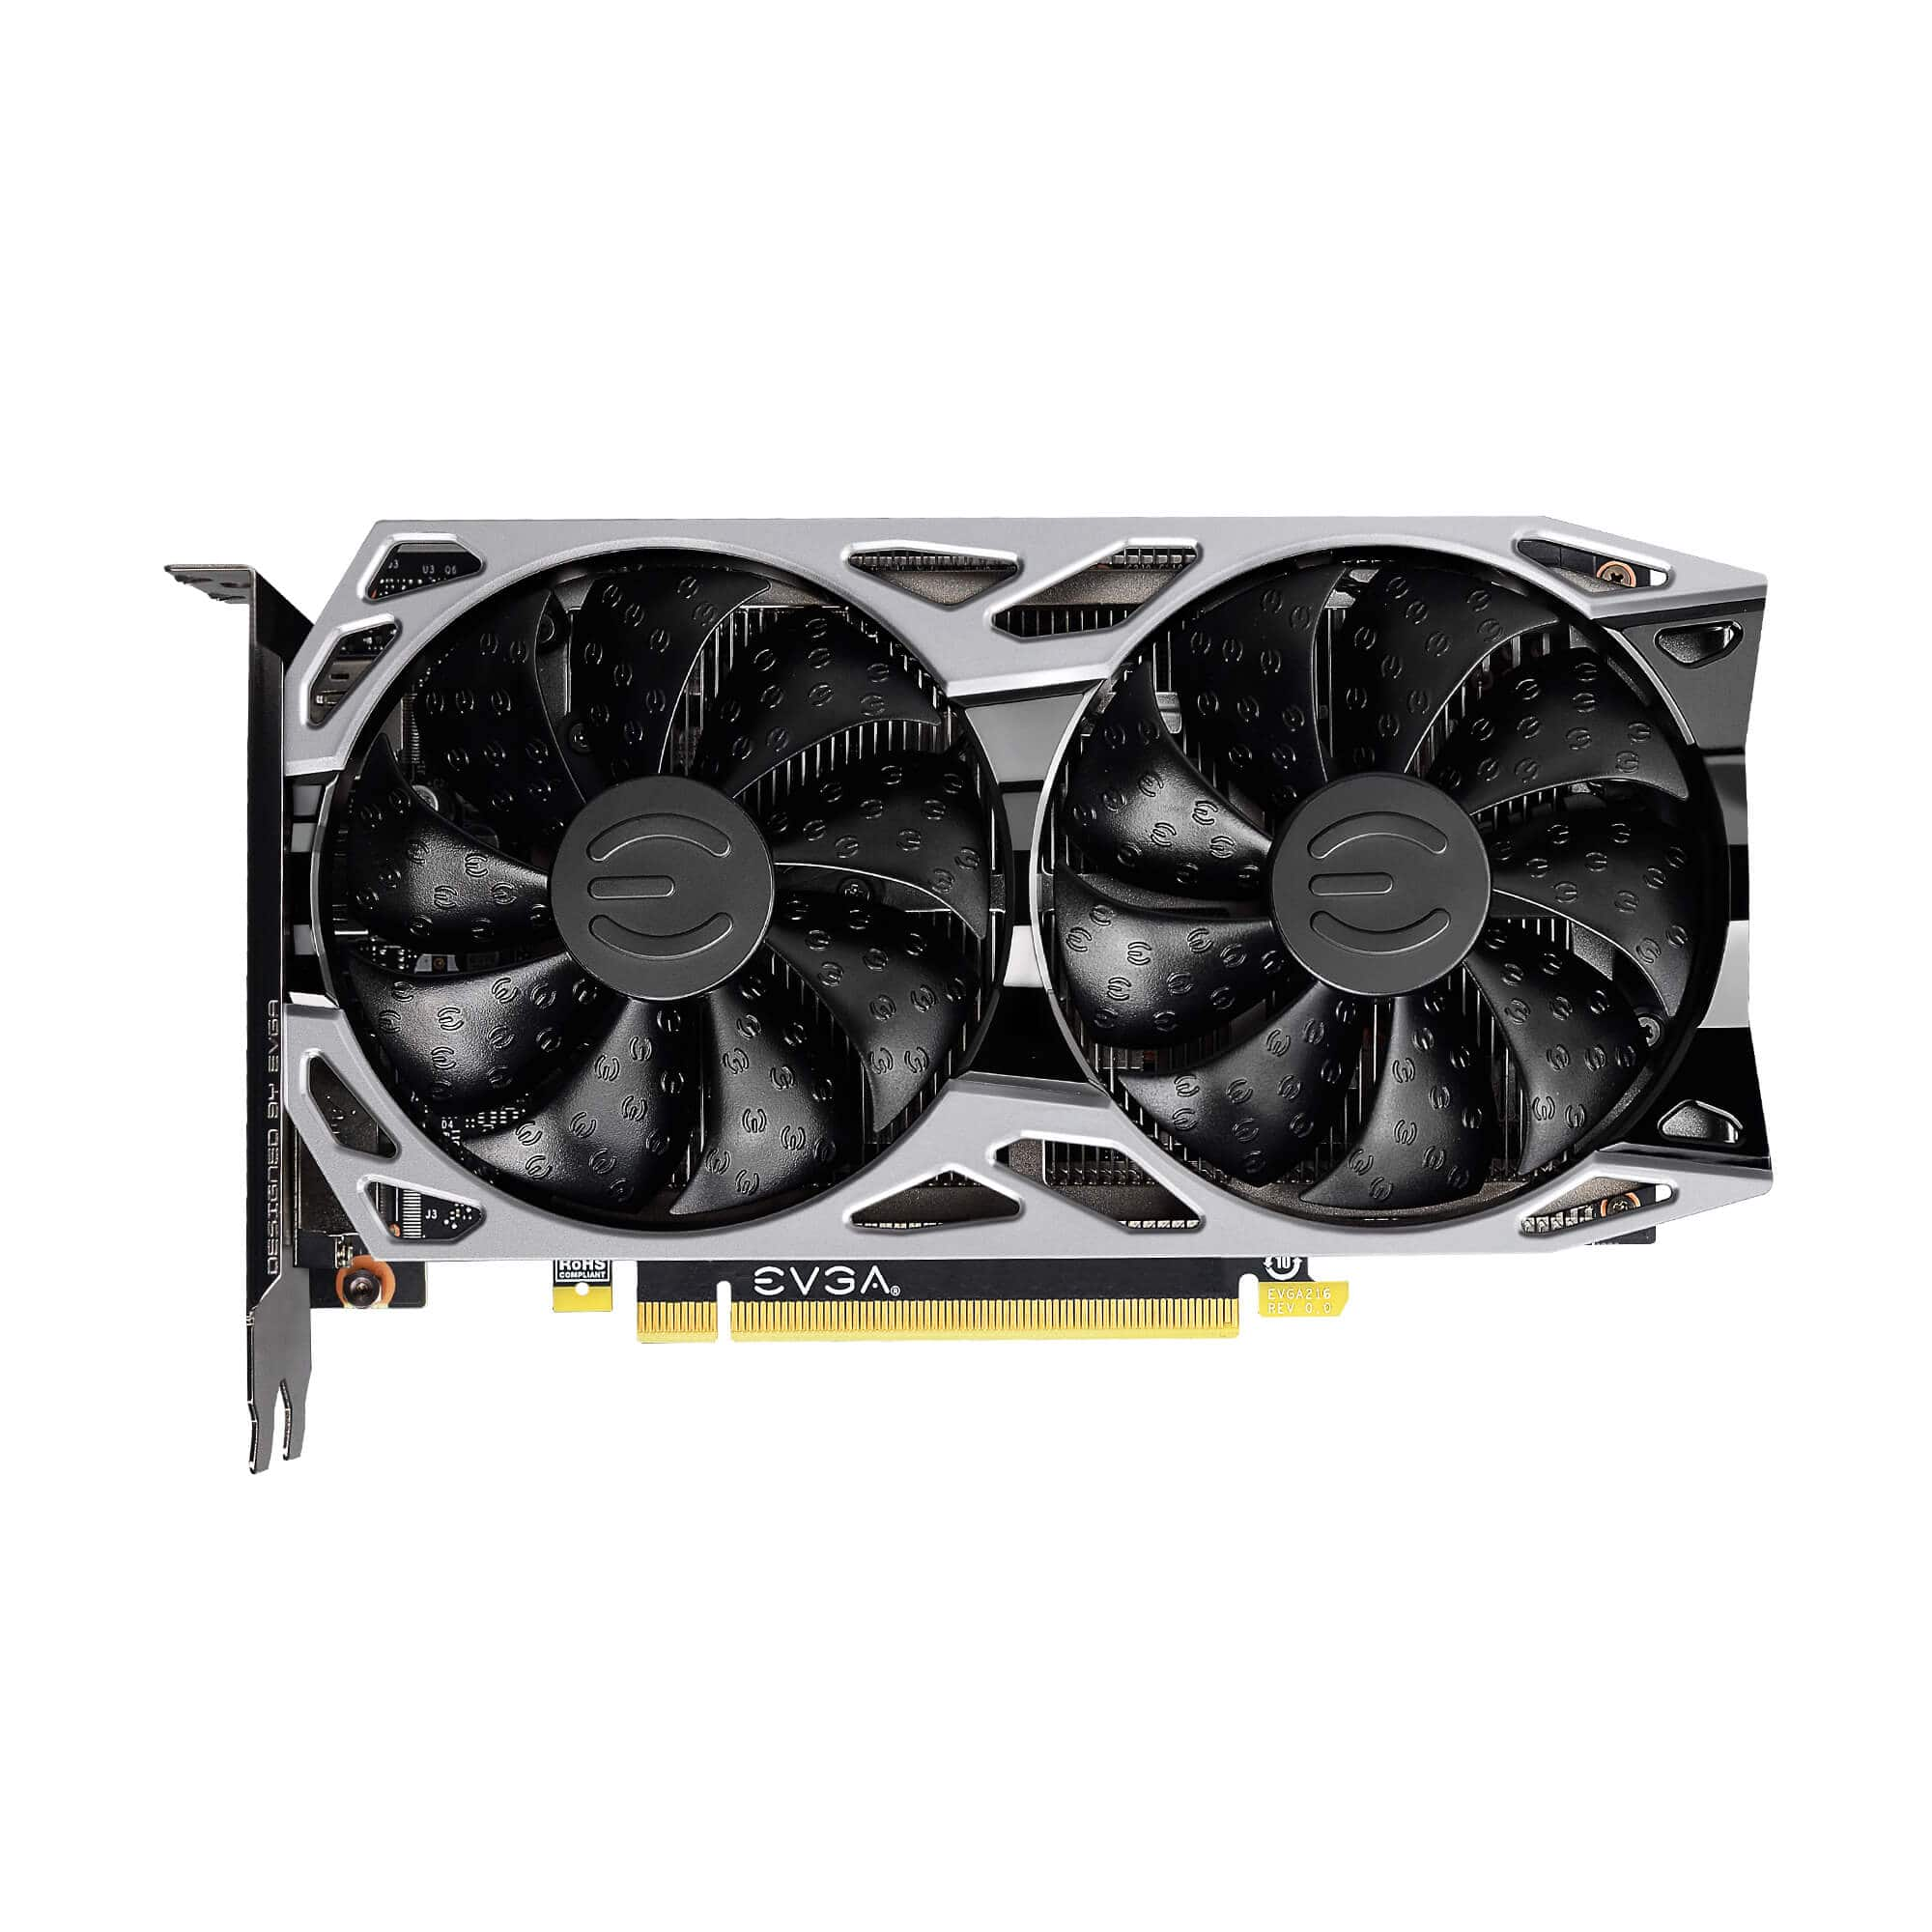 EVGA GeForce RTX 2060 6 GB $319.99